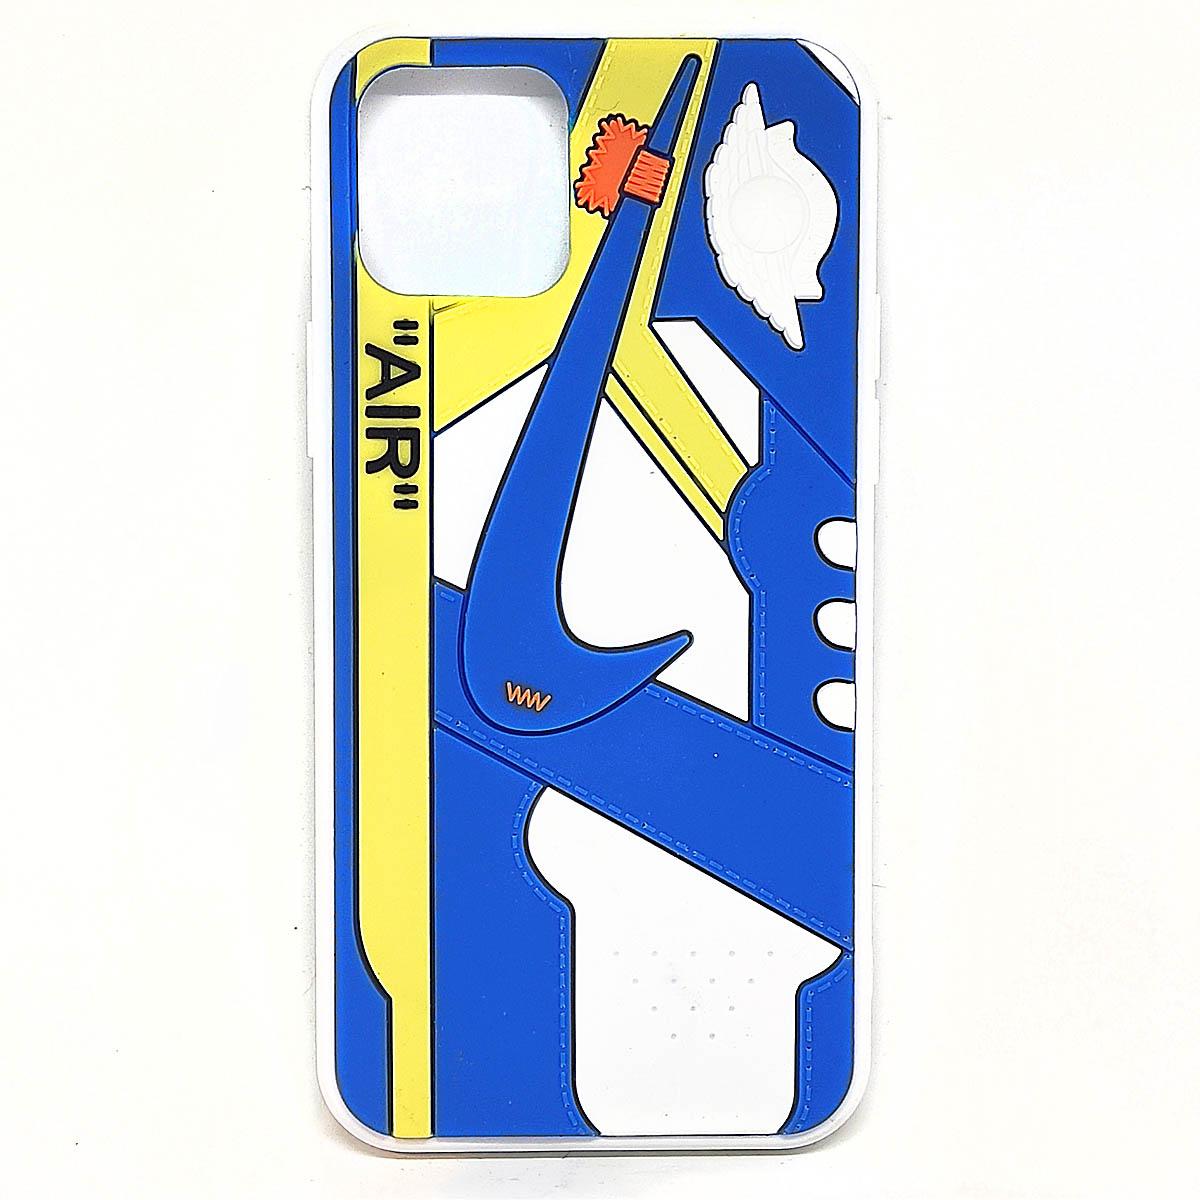 Cover AJ1 Chicago blu per iphone 11, 11 pro, 11 pro max   Blacksheep Store